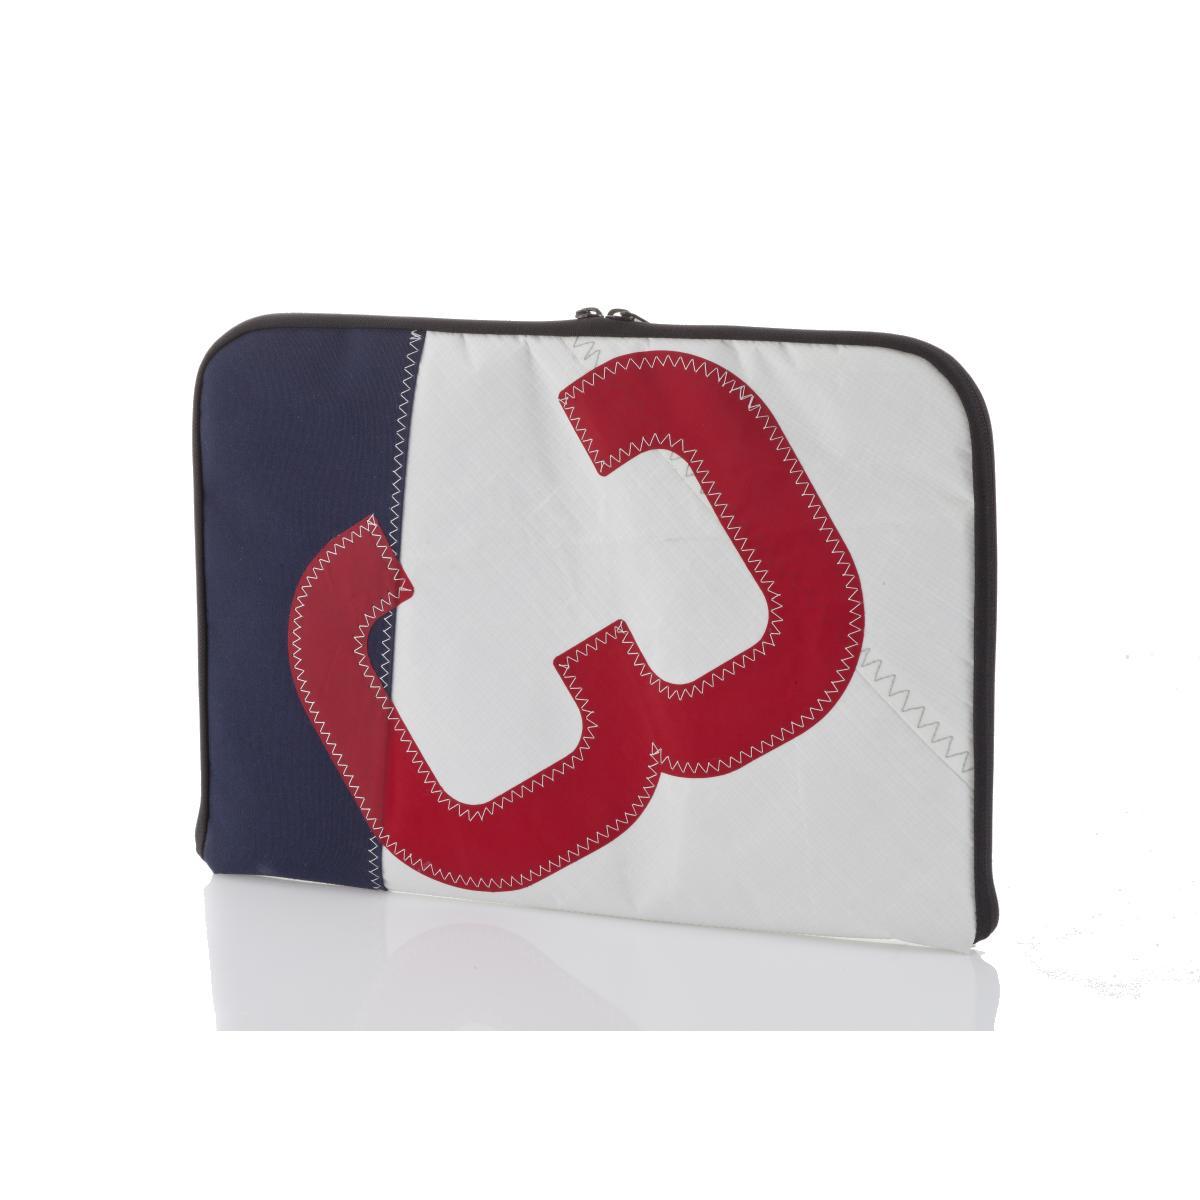 Harry Laptop Tasche / Sleeve Dacron, 13 Zoll Nr. 3 rot